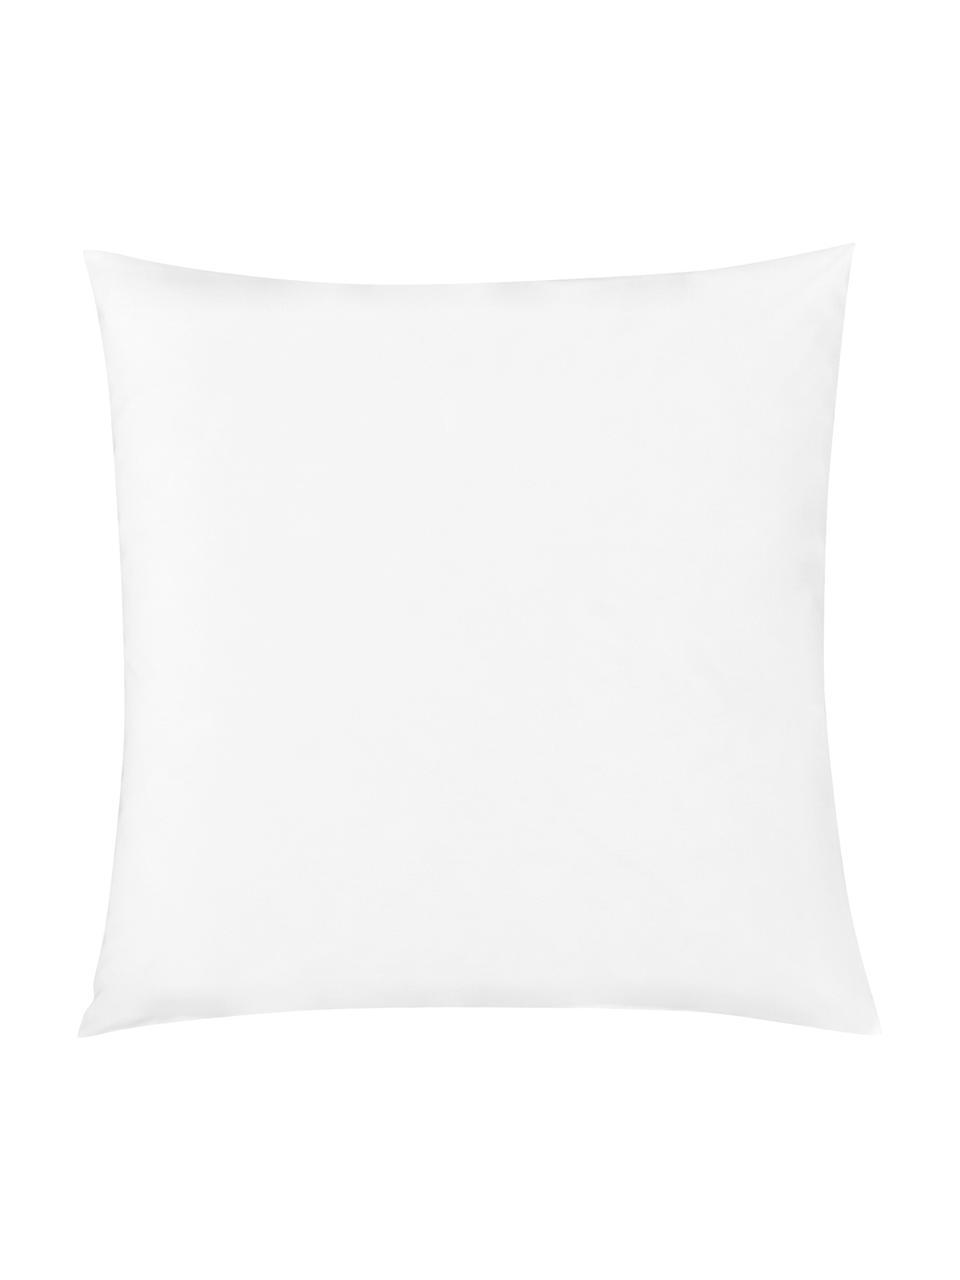 Taie d'oreiller 65x65 percale Elsie, 2pièces, Blanc